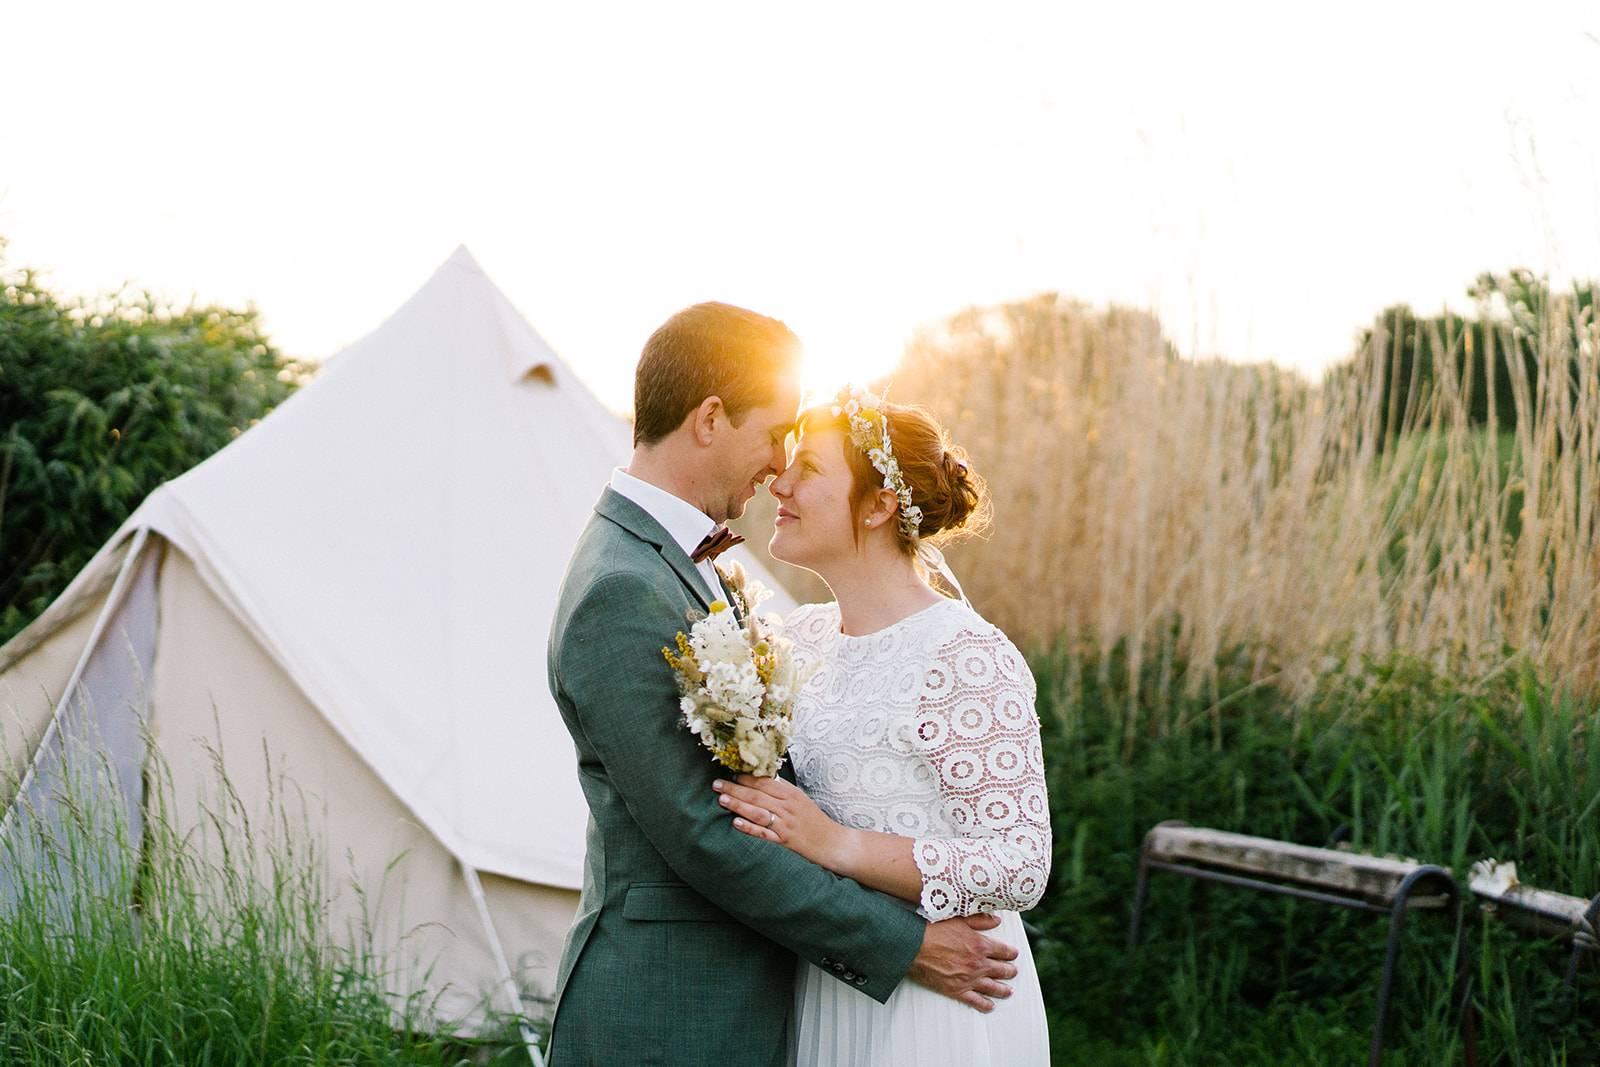 Hilde Eyckmans - CarolineSteven55mmb- Hilde Eyckmans -1 - House of Weddings